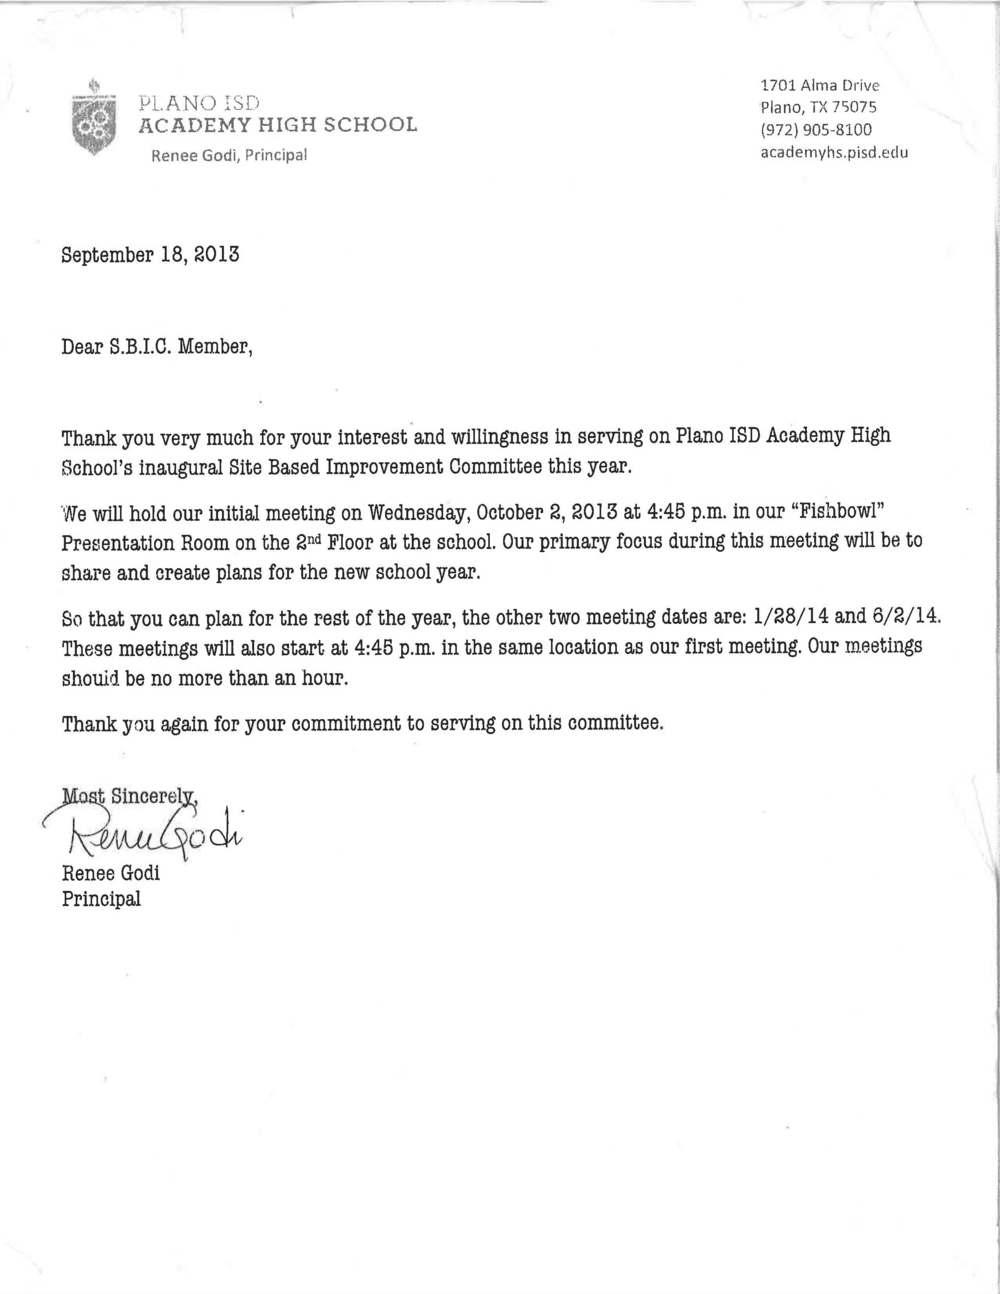 Resume ryan pearlman sbic board invitation letter stopboris Image collections